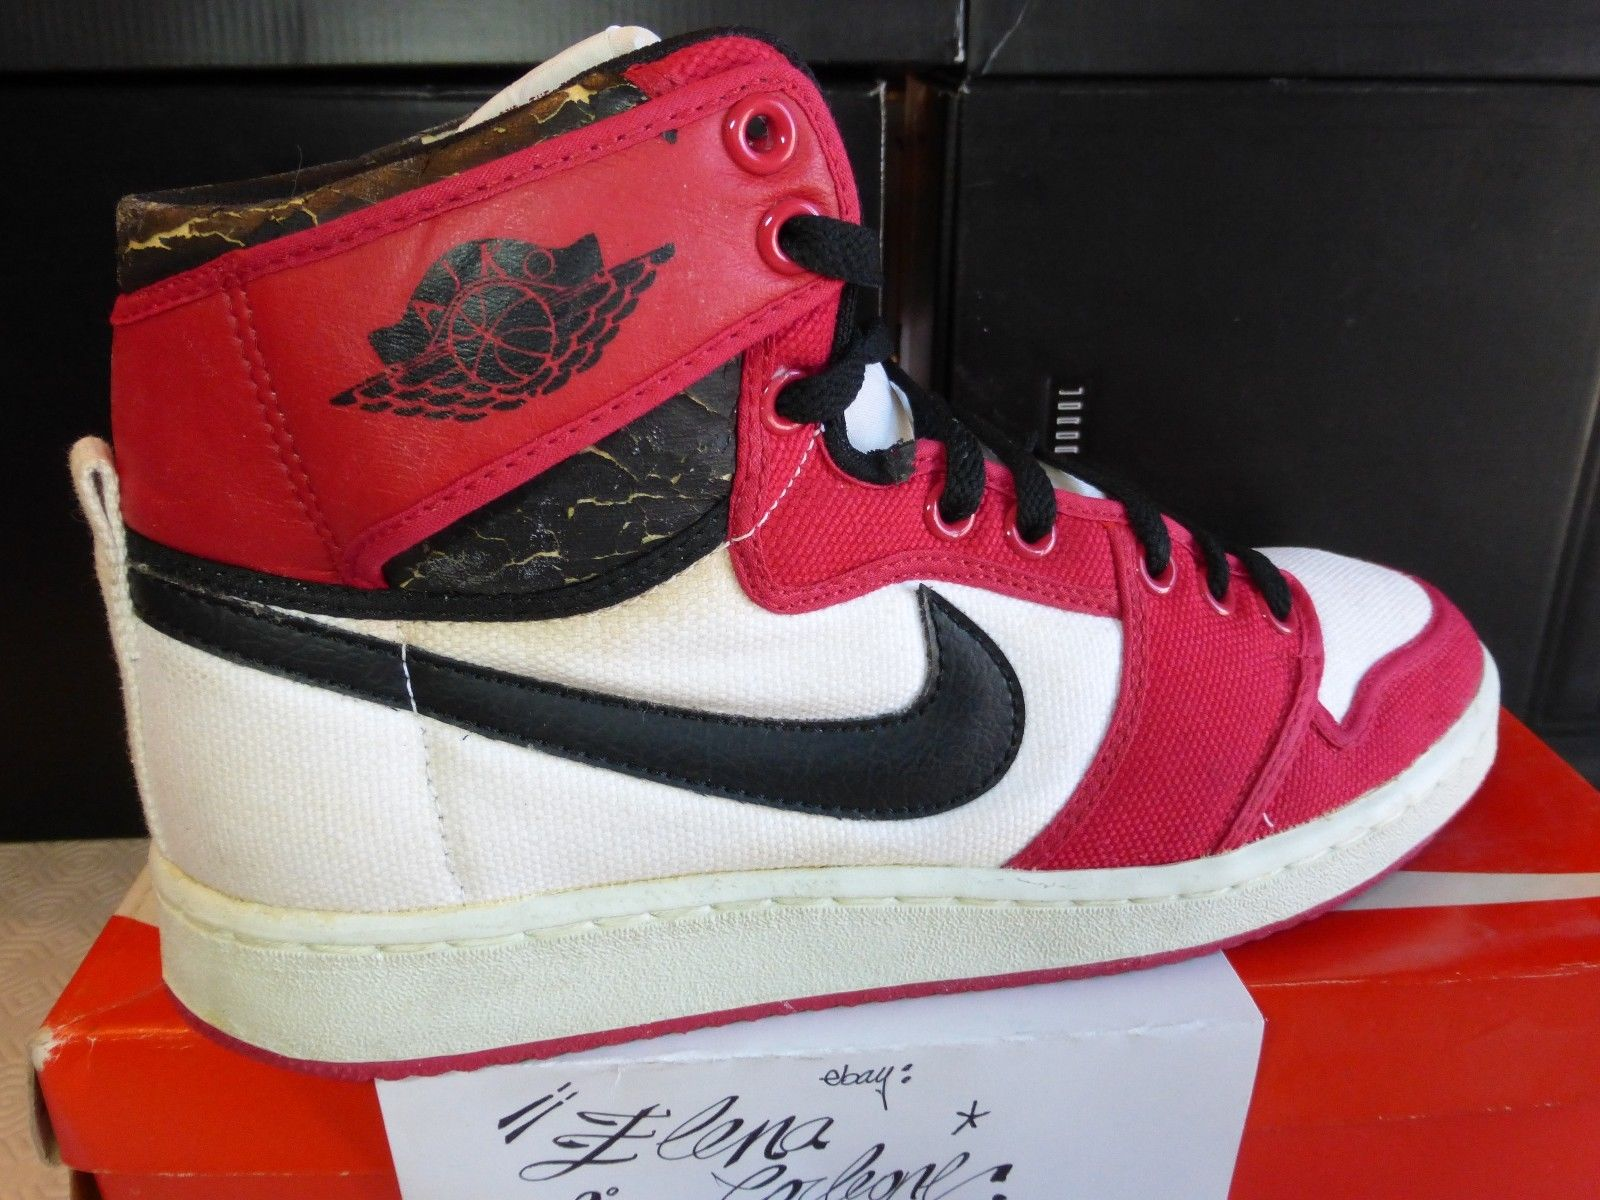 18db4910e87 1st pair of air jordans on sale   OFF76% Discounts